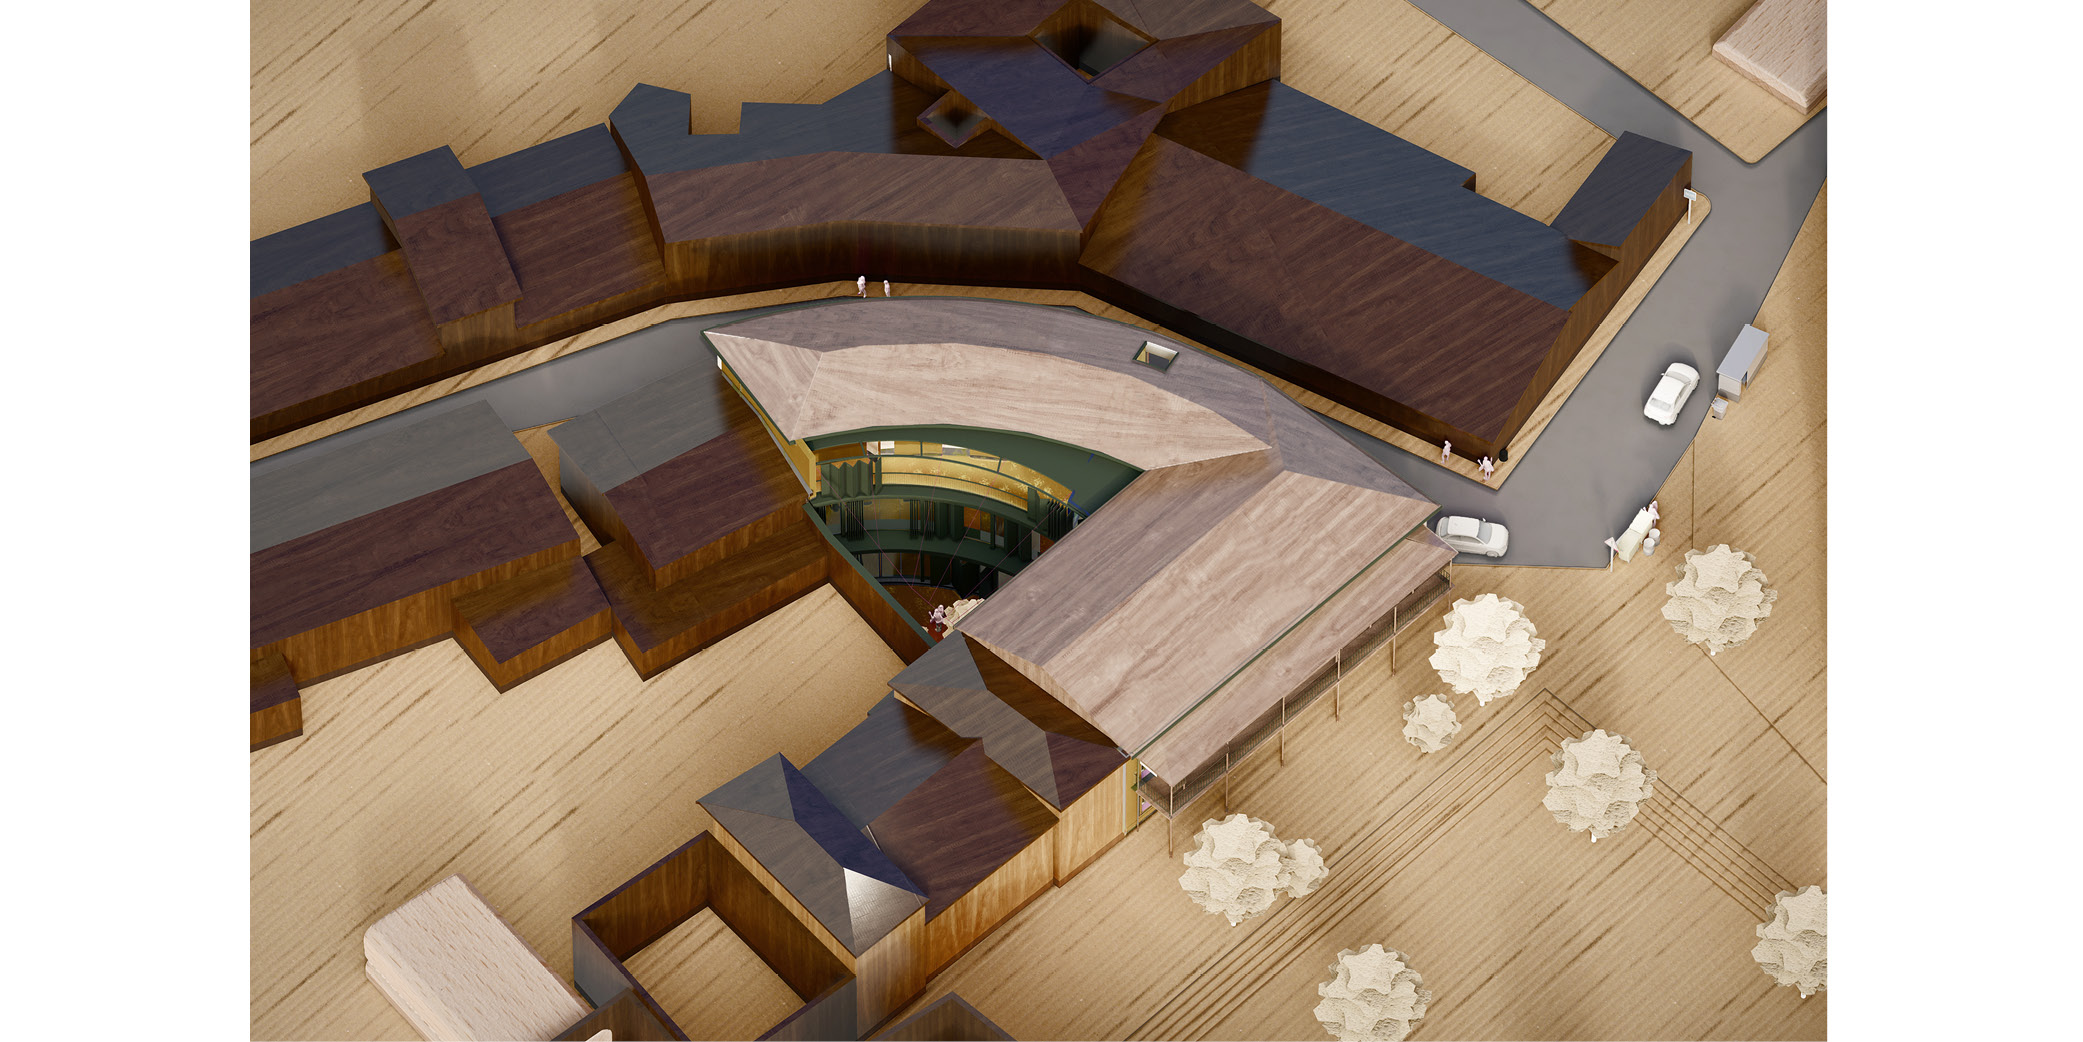 Daganzo City Hall Extention Architecture Arquitectura OCA ARCHITECTS OCA arquitectas Hernan Lleida Bernardo Garcia_1